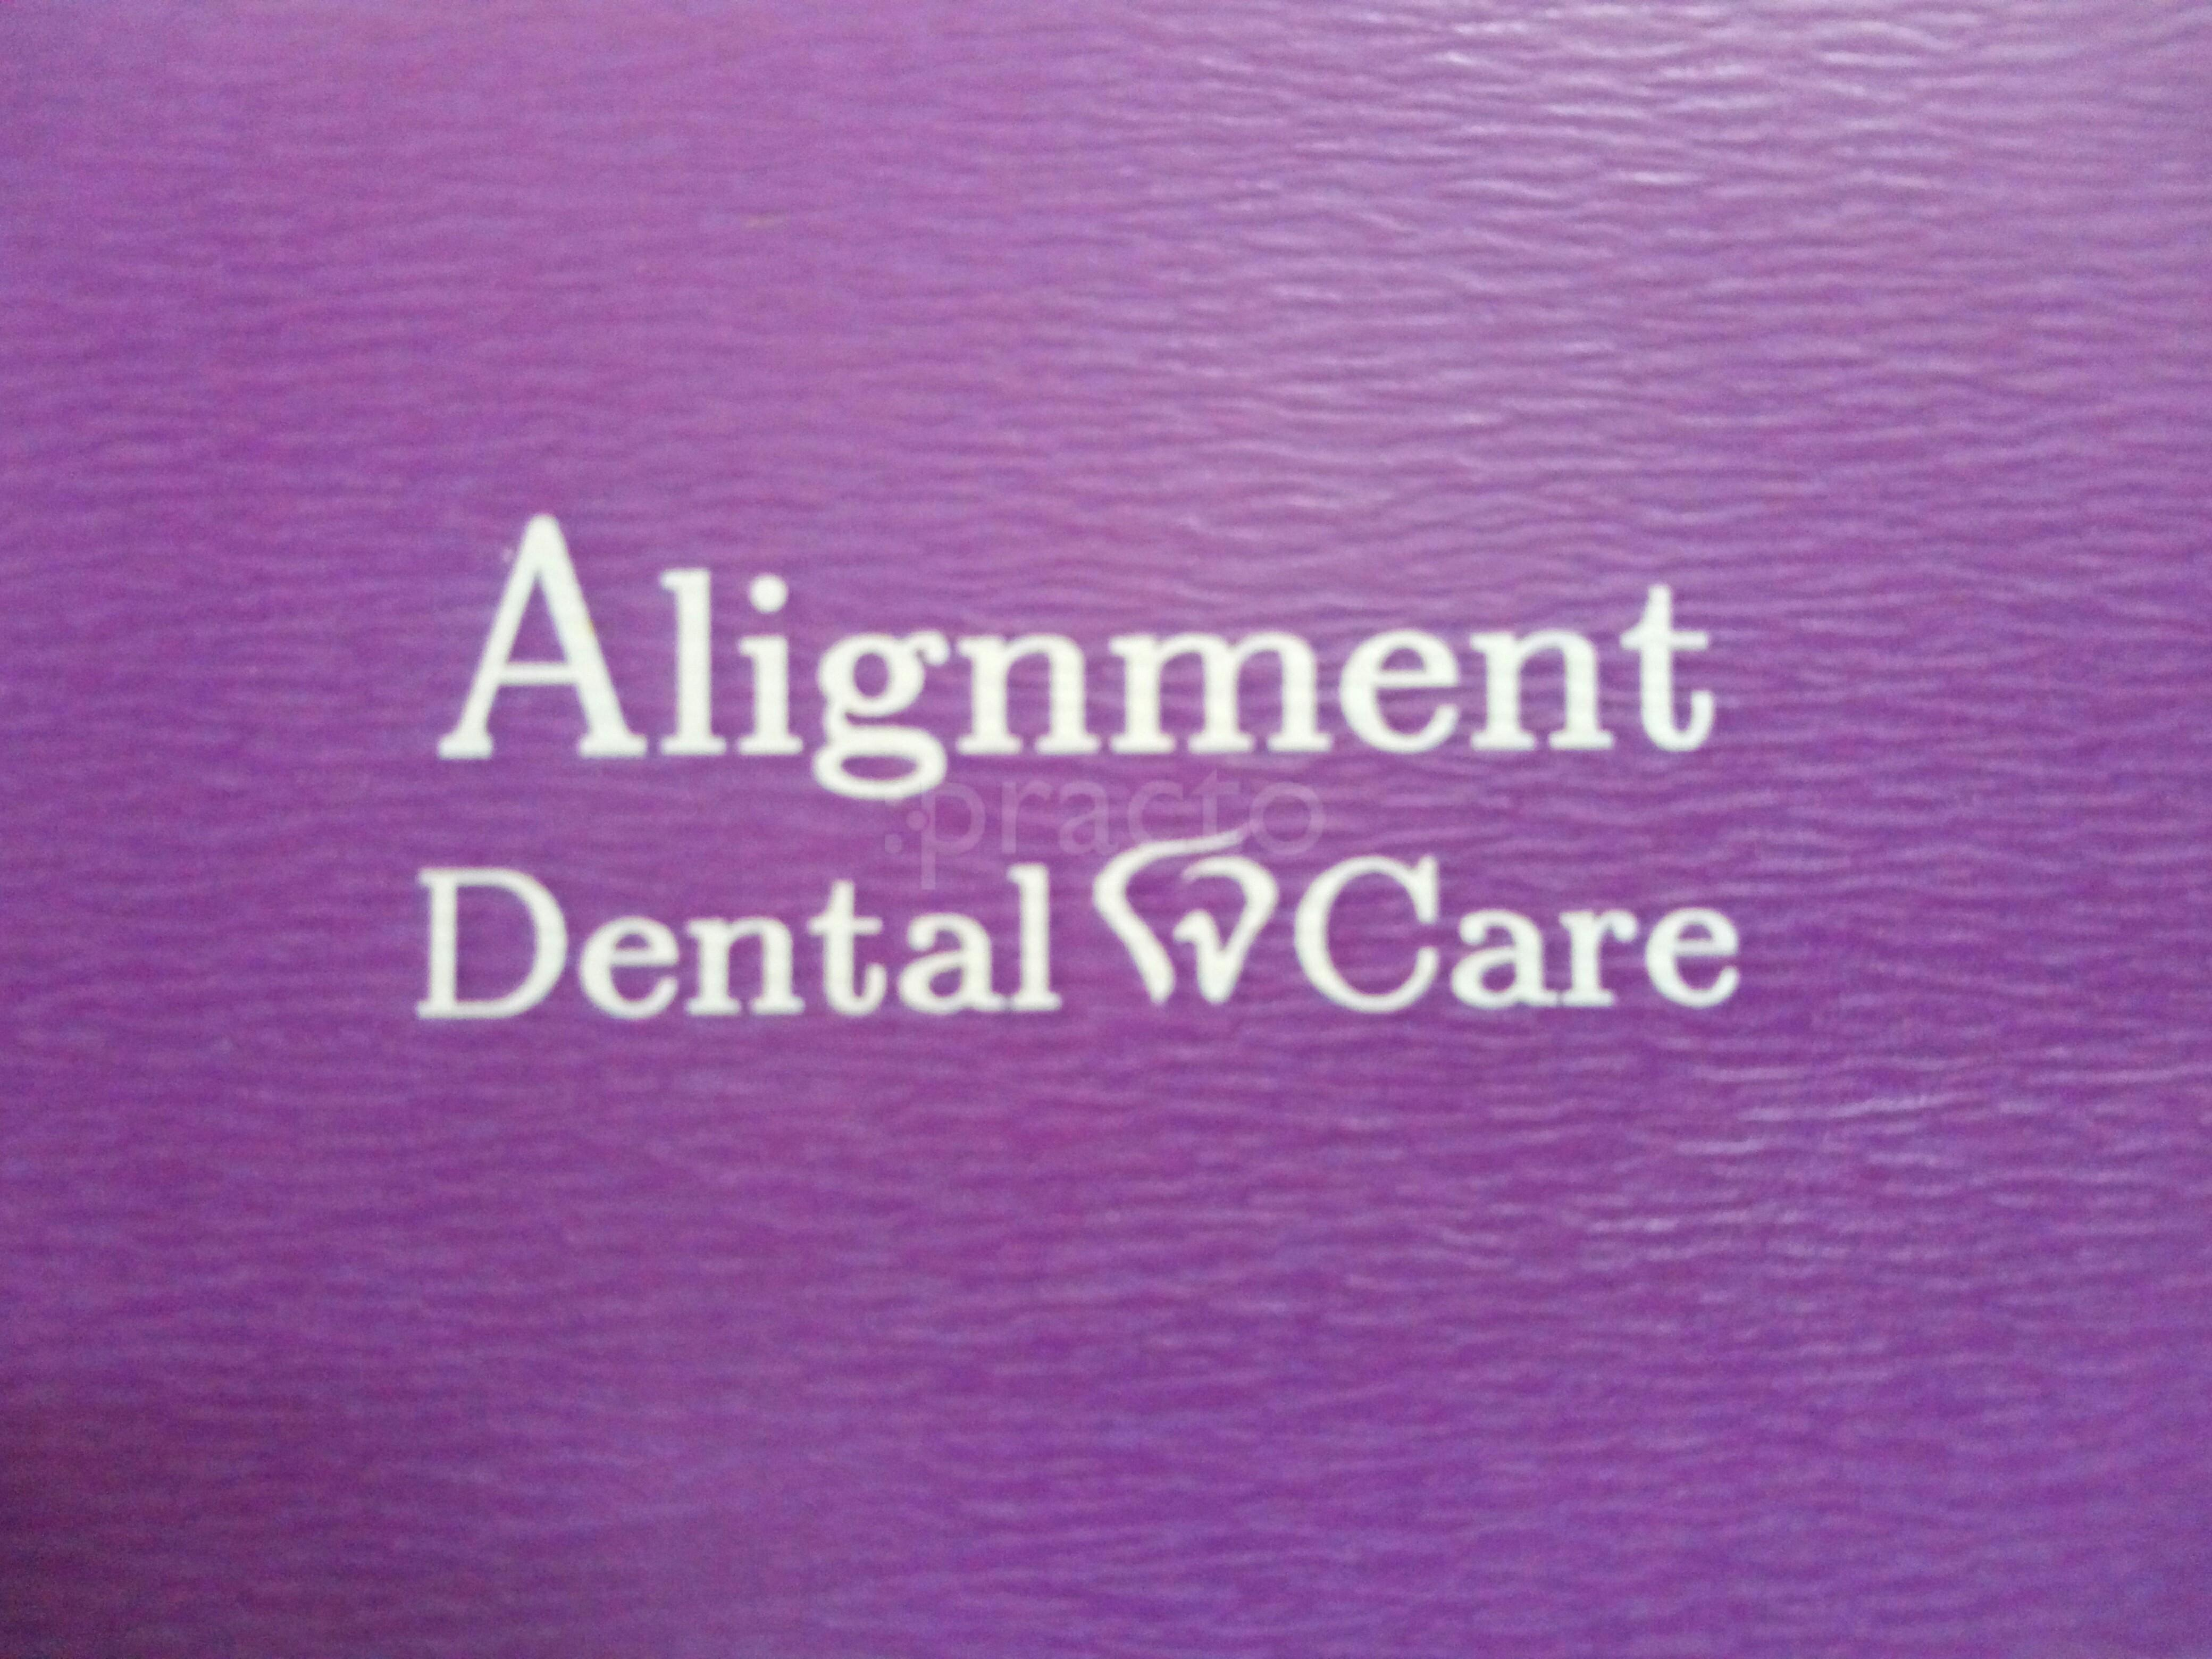 Alignment Dental Care